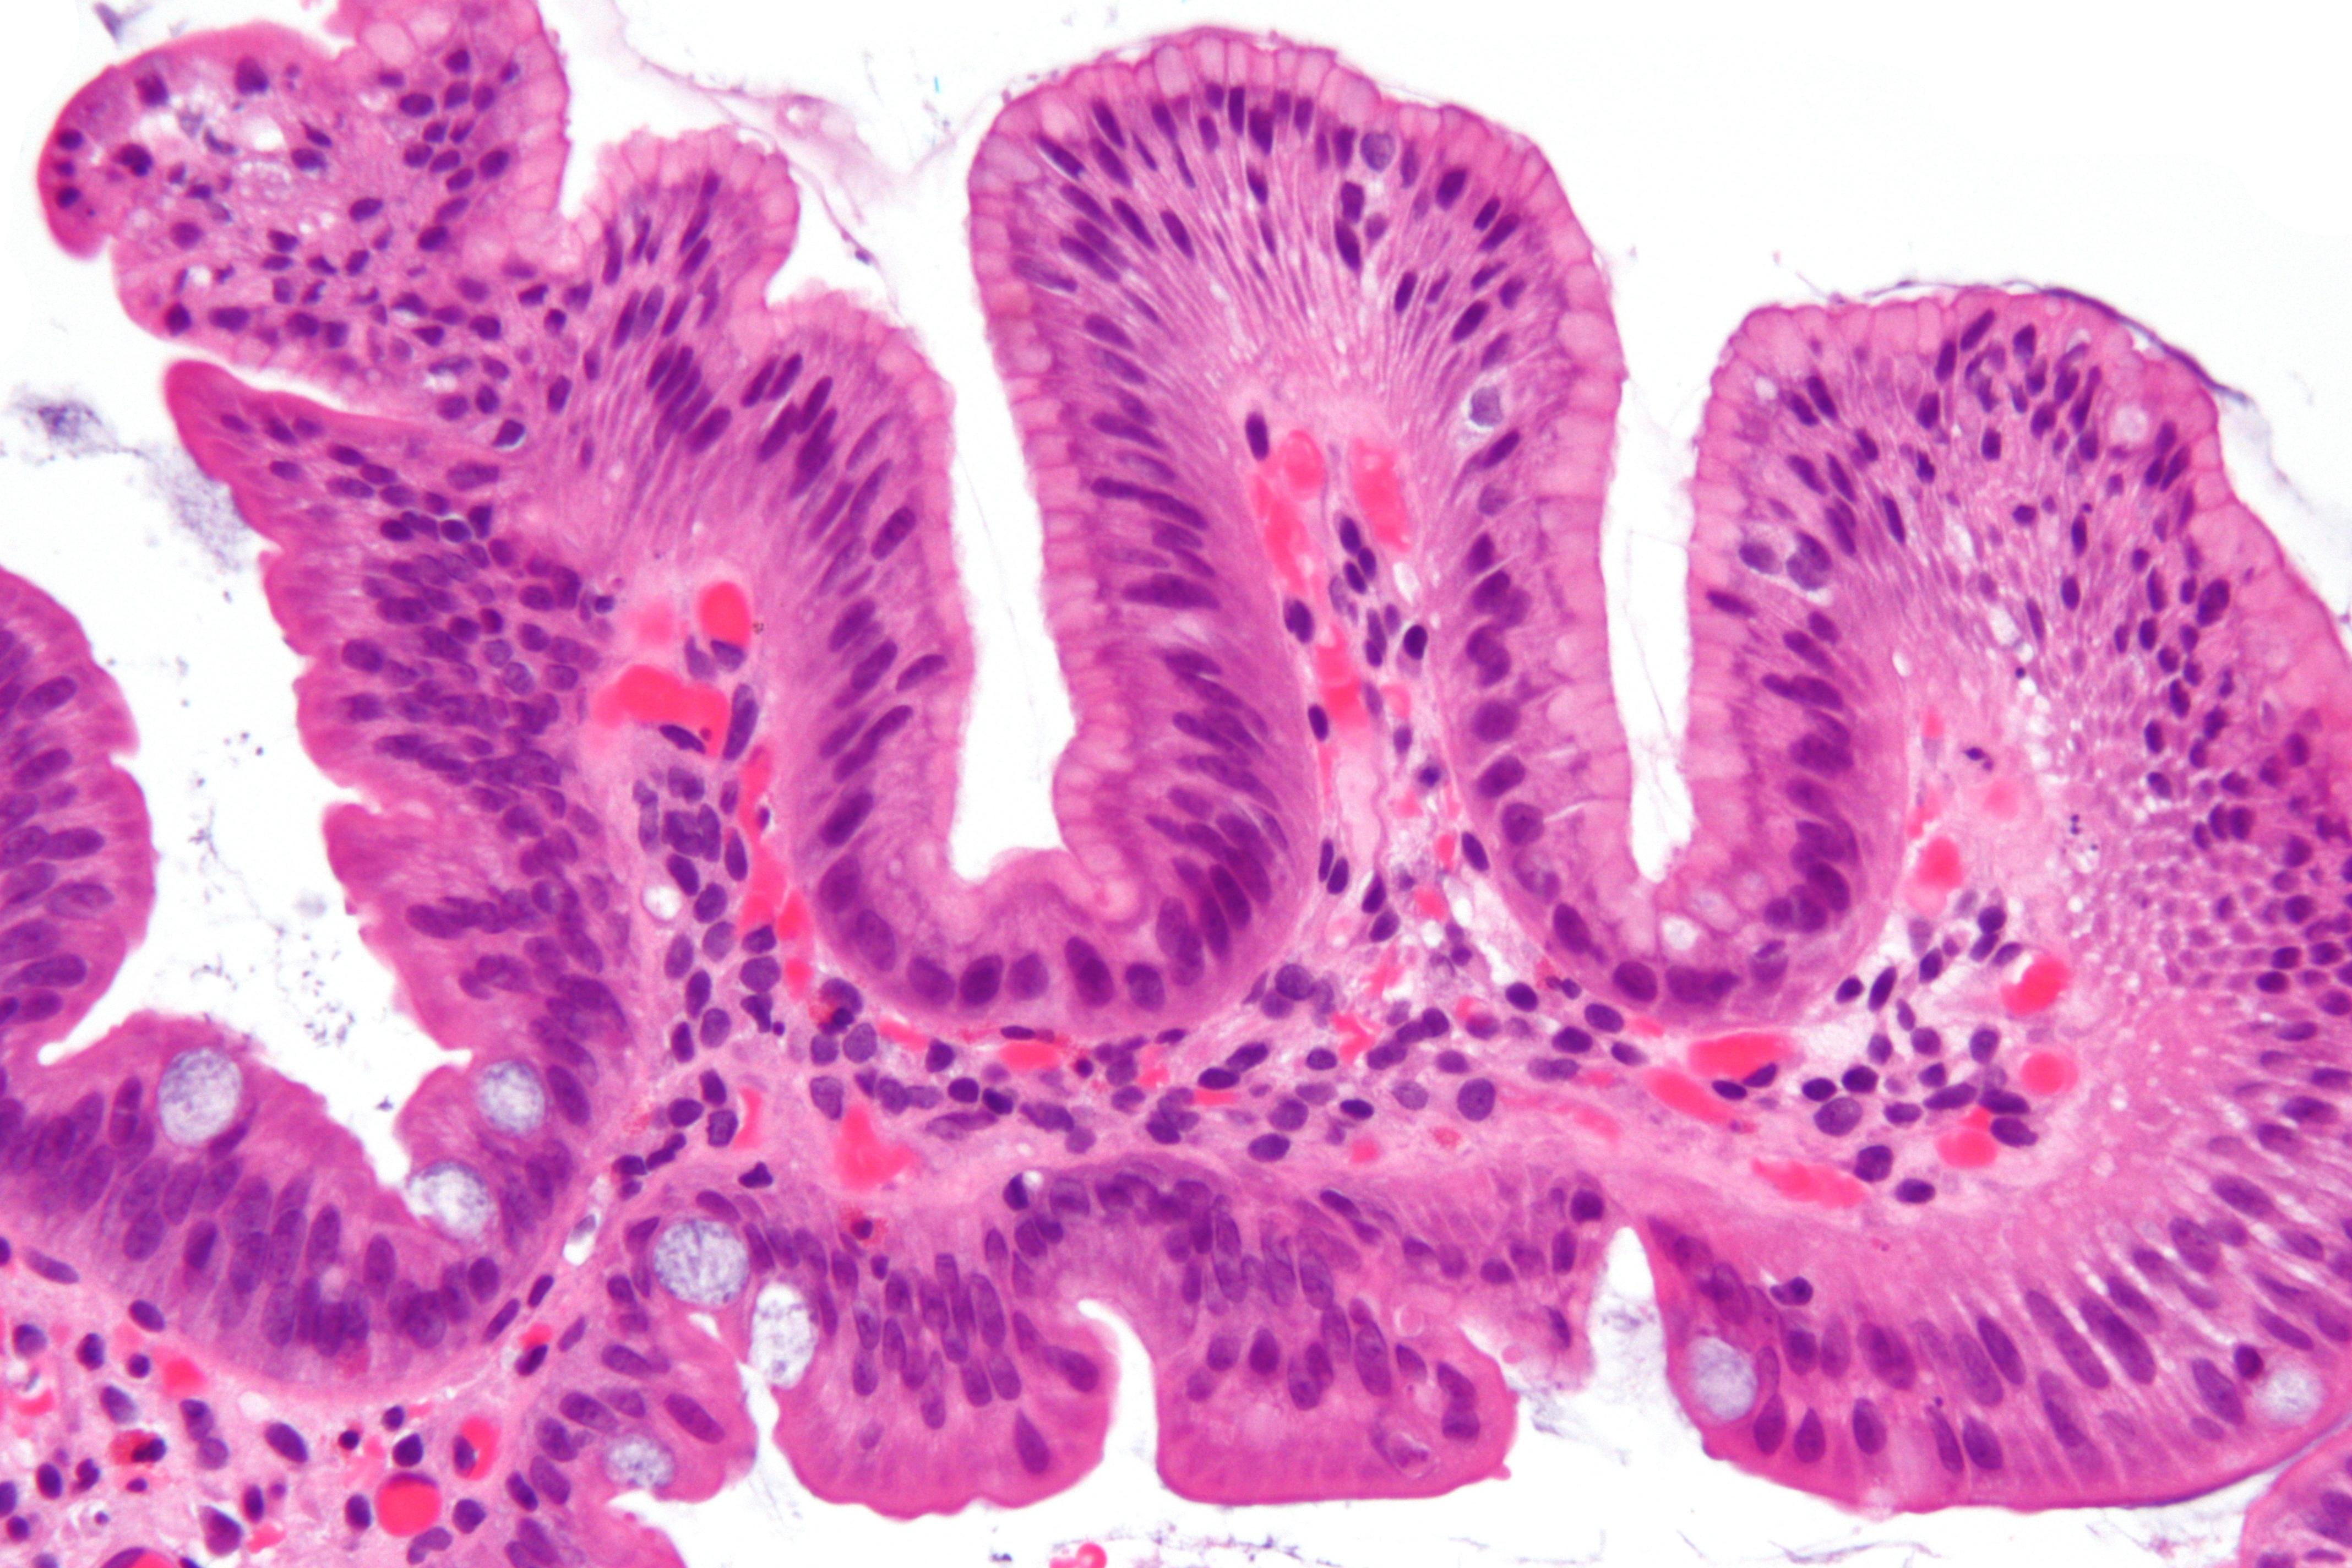 Gastric Intestinal